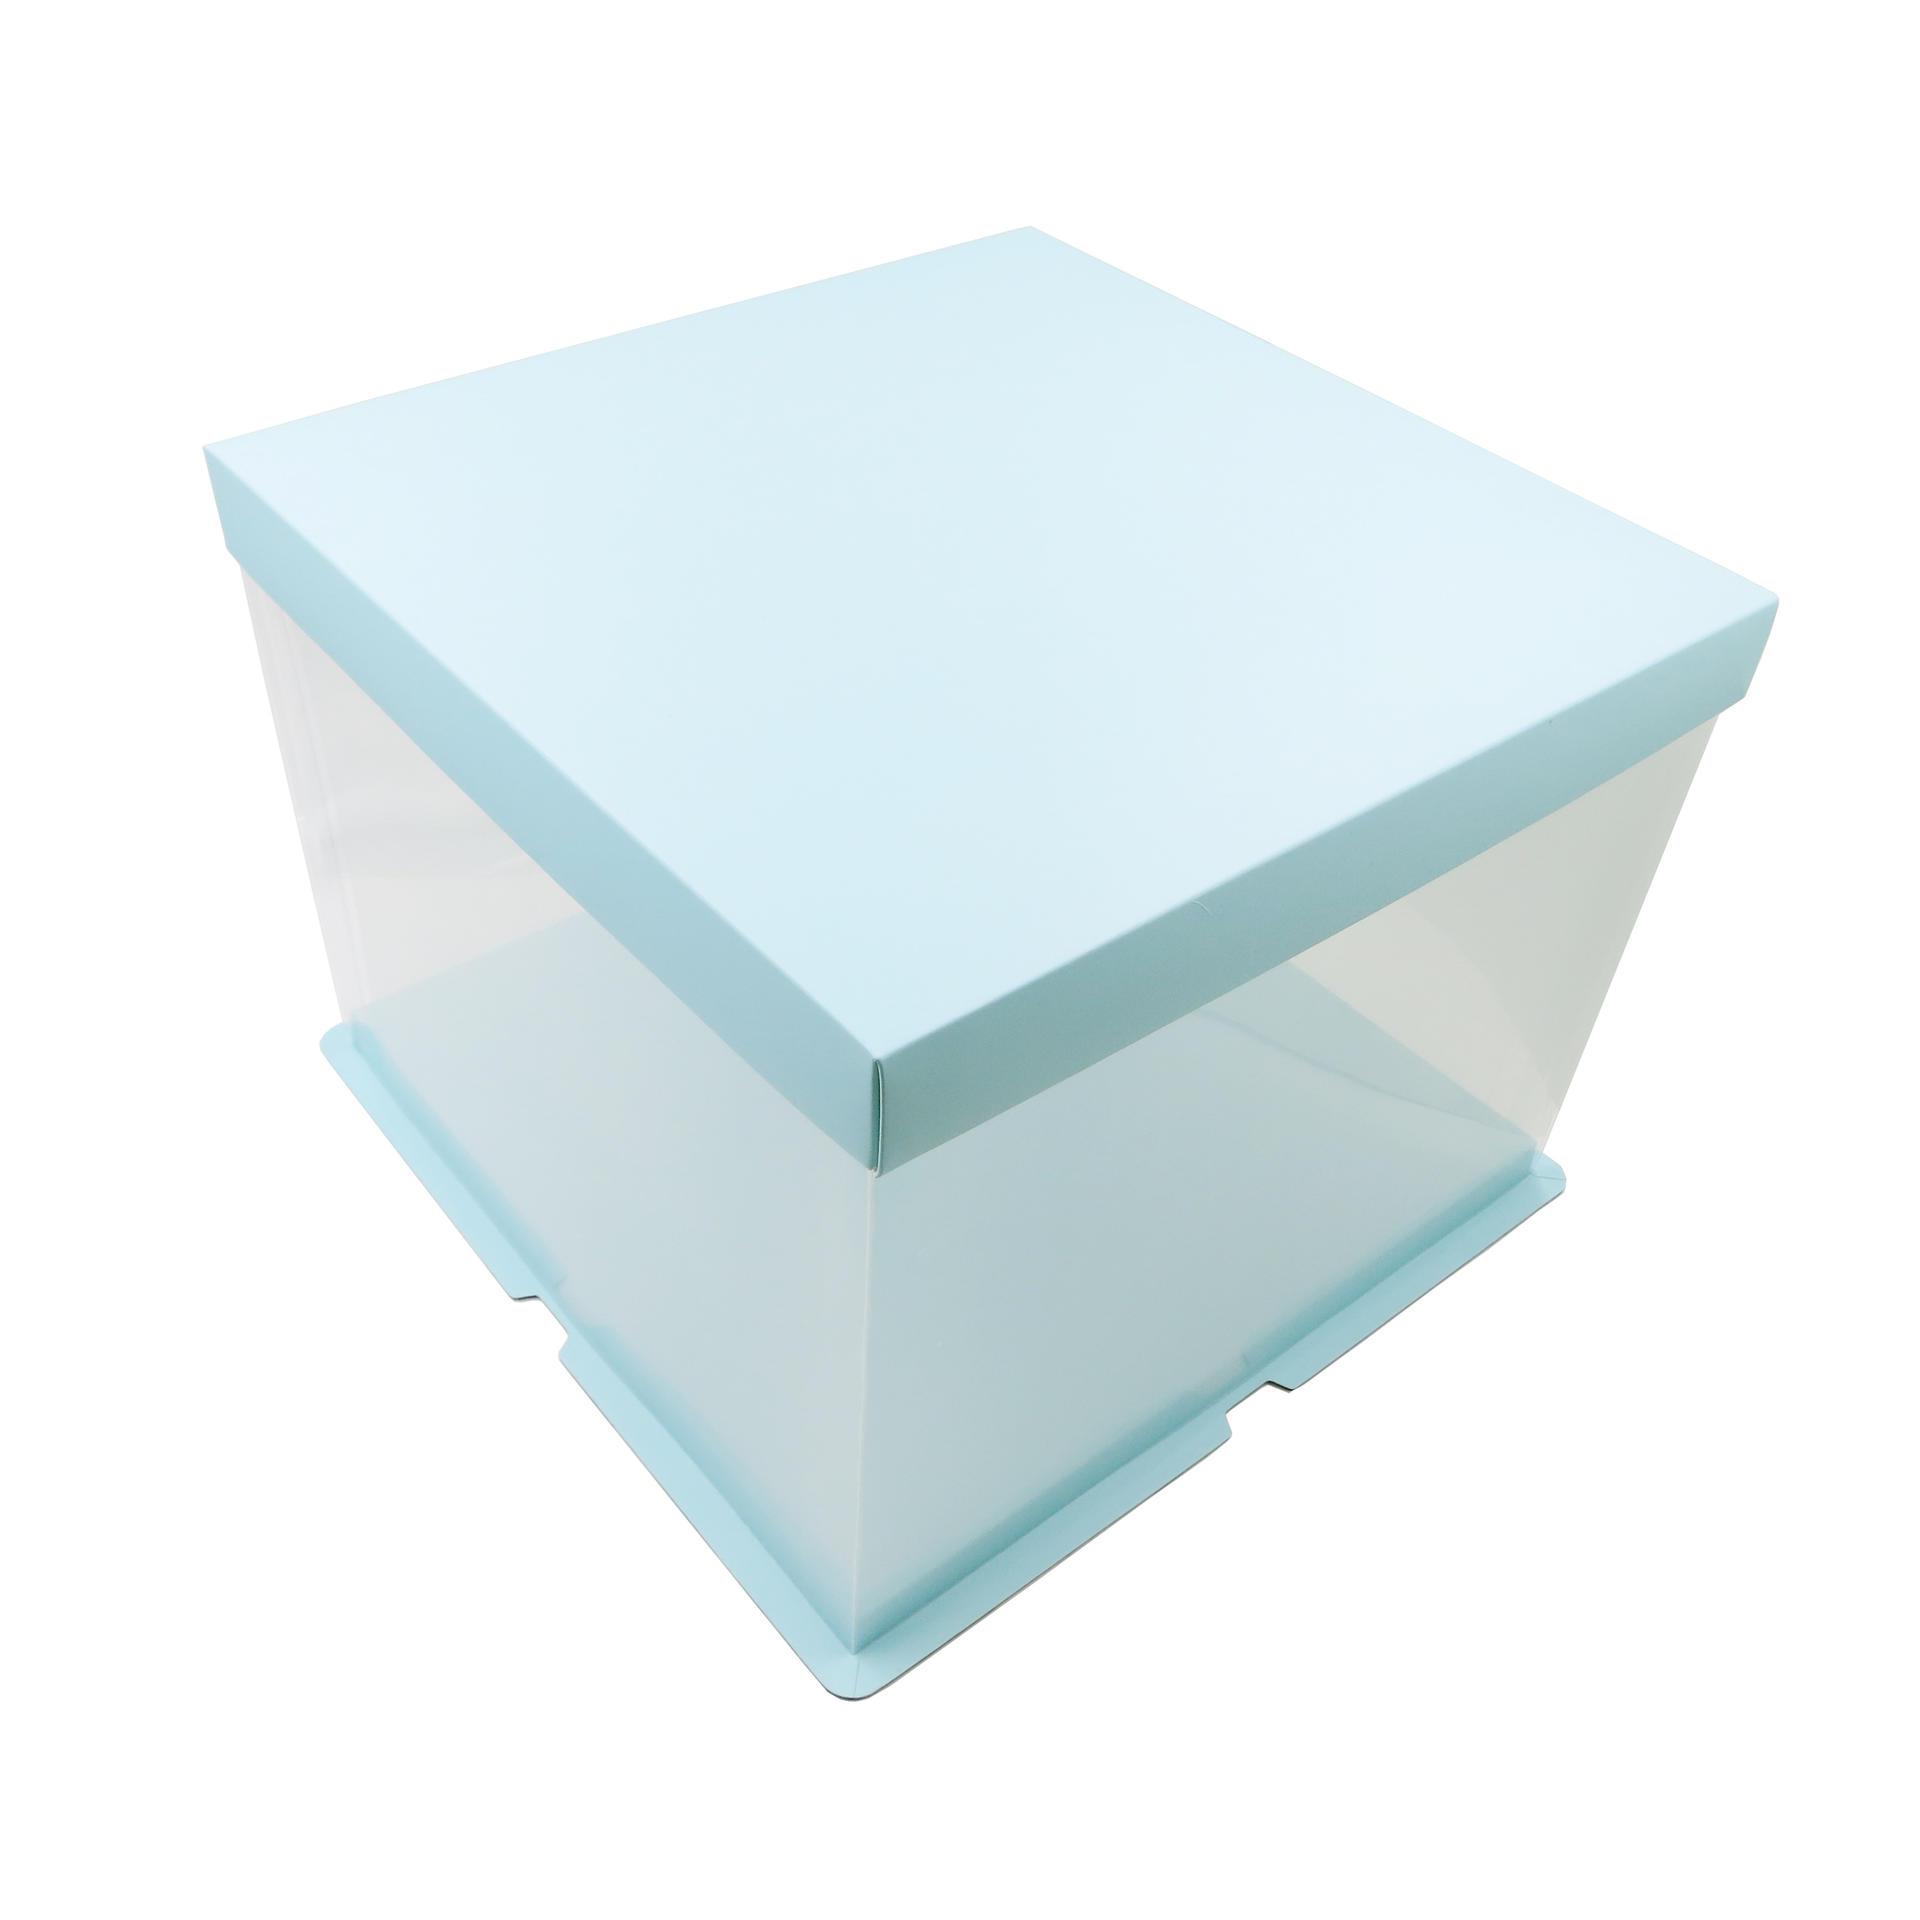 Food Grade PET Plastic Cake Box for 10